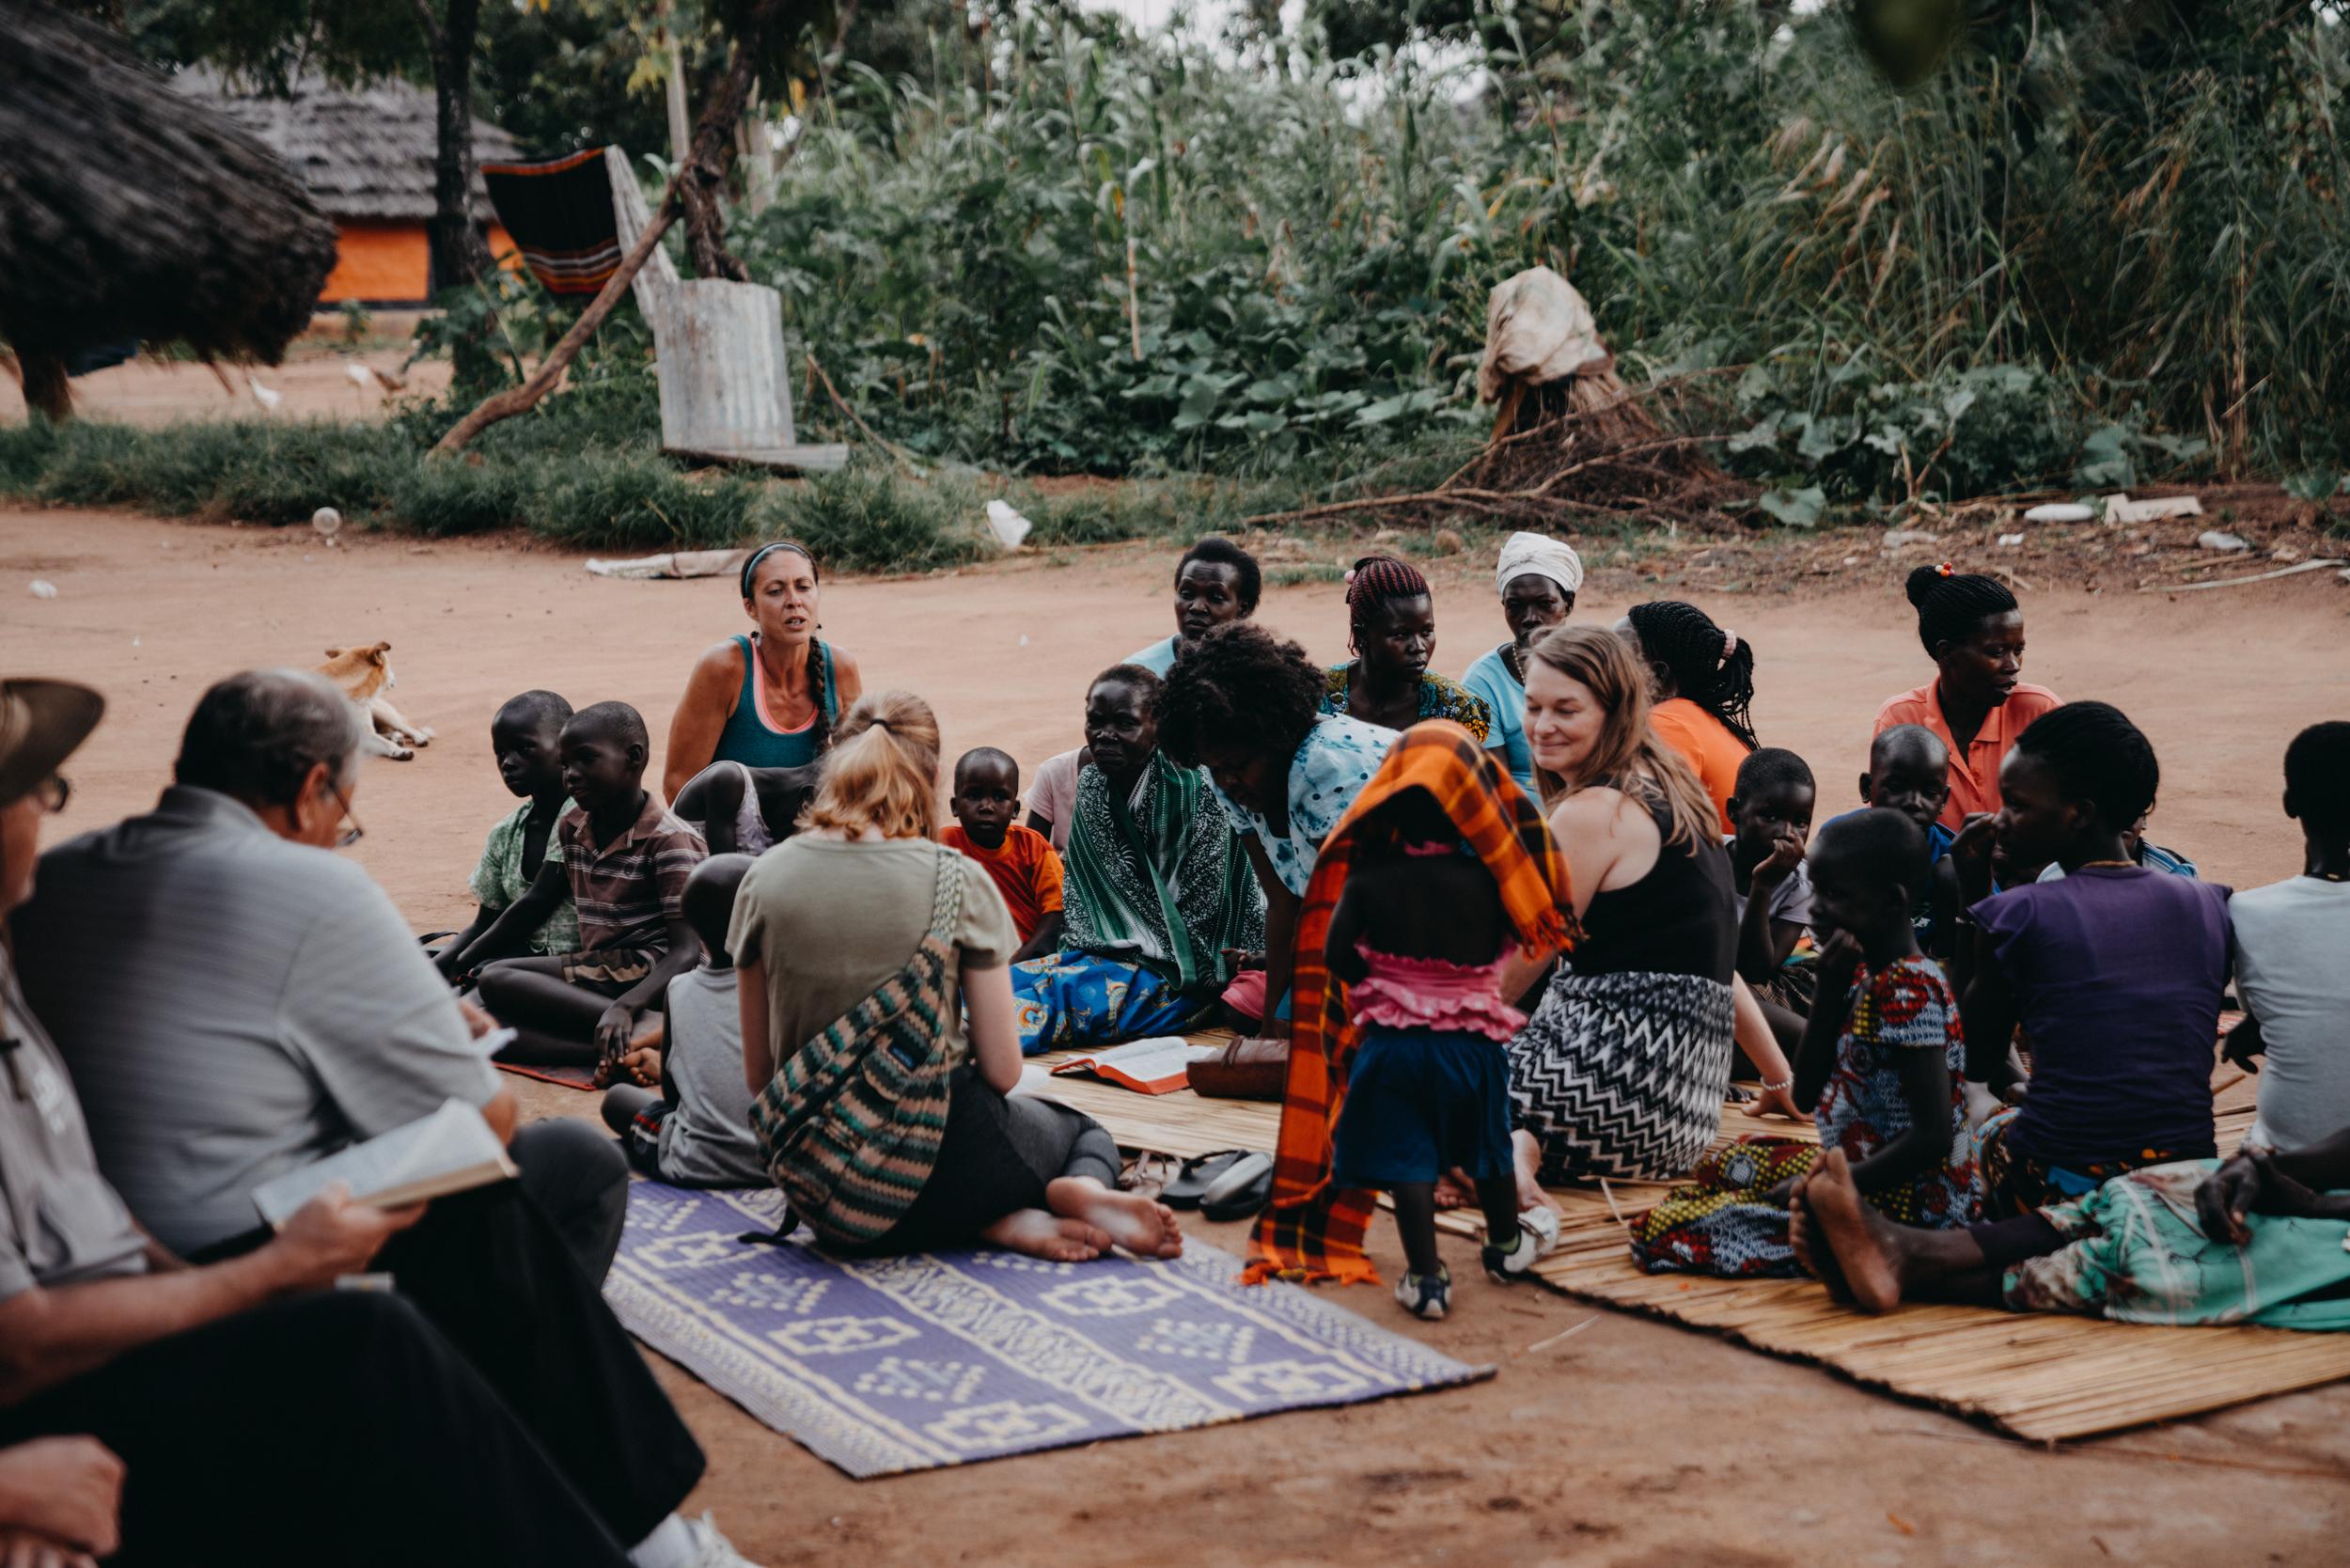 uganda july 2018-7.jpg